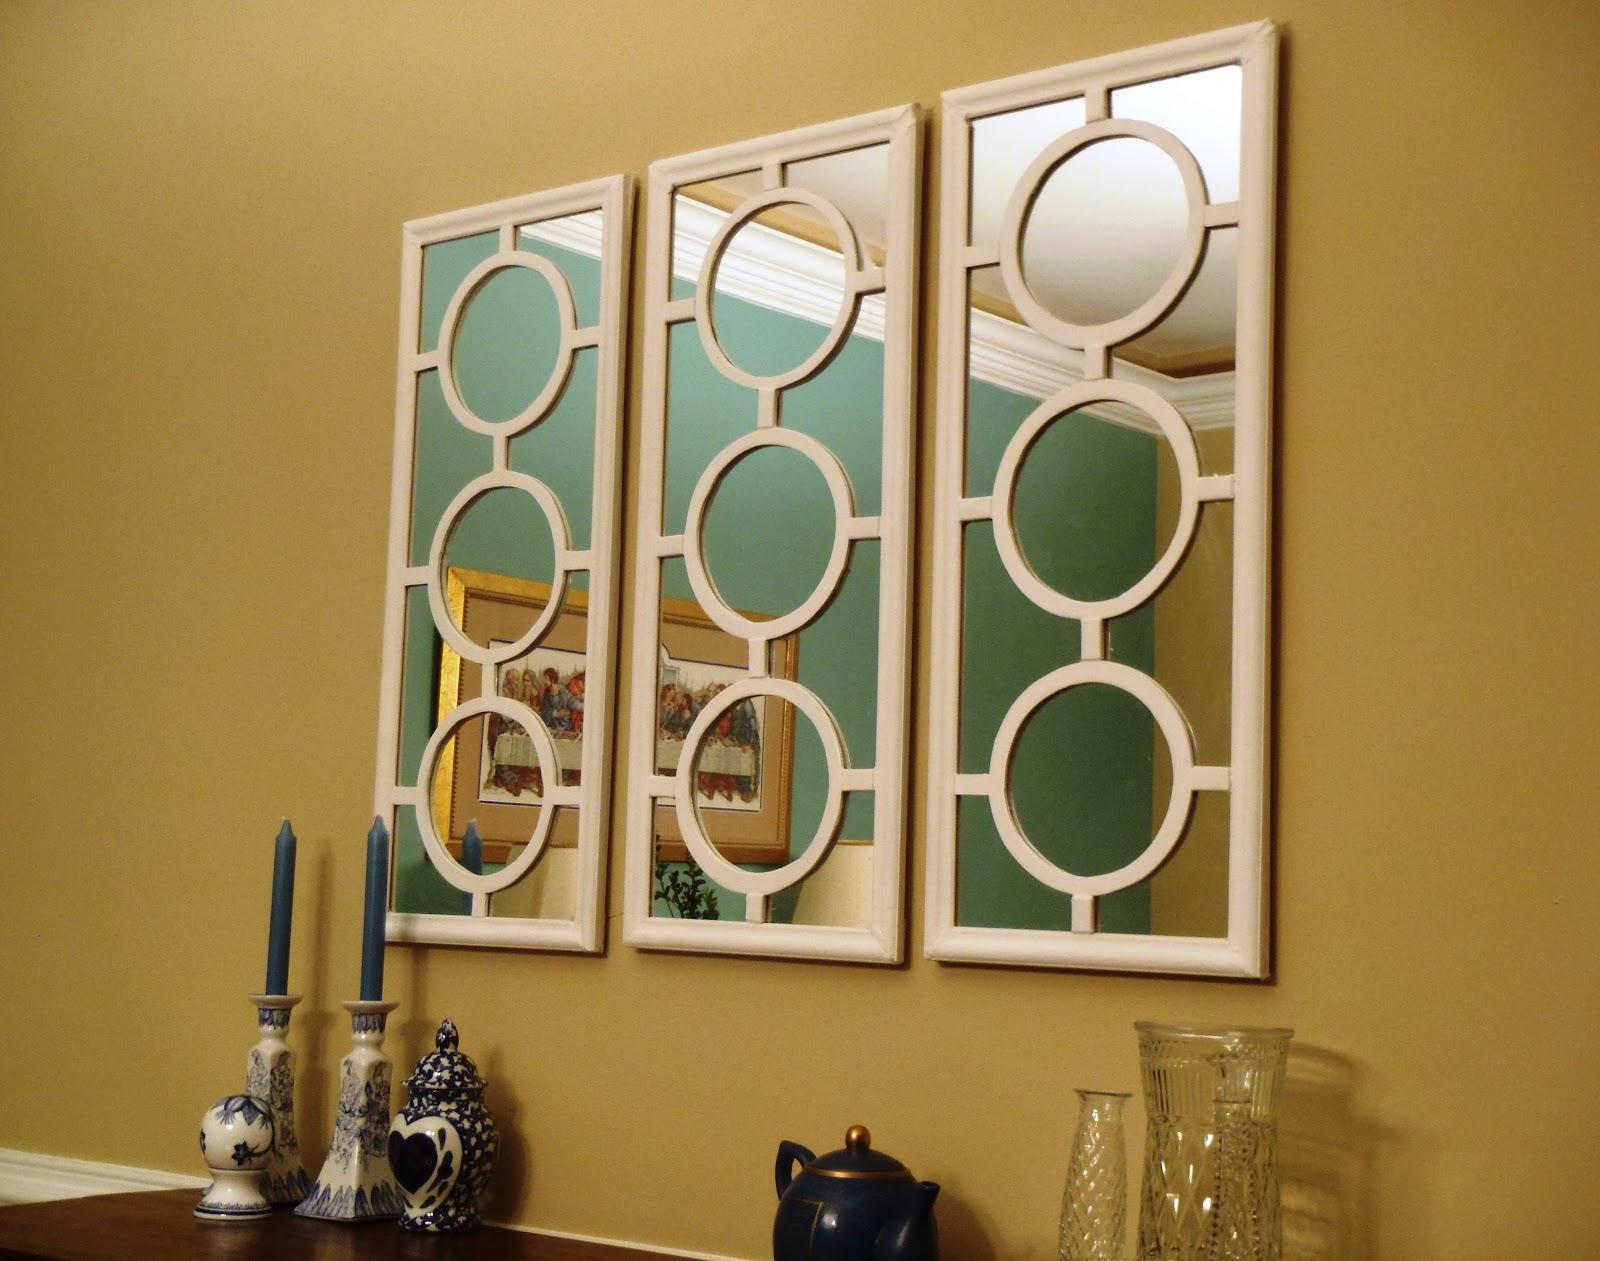 Lazy Liz on Less: Dining wall mirror decor